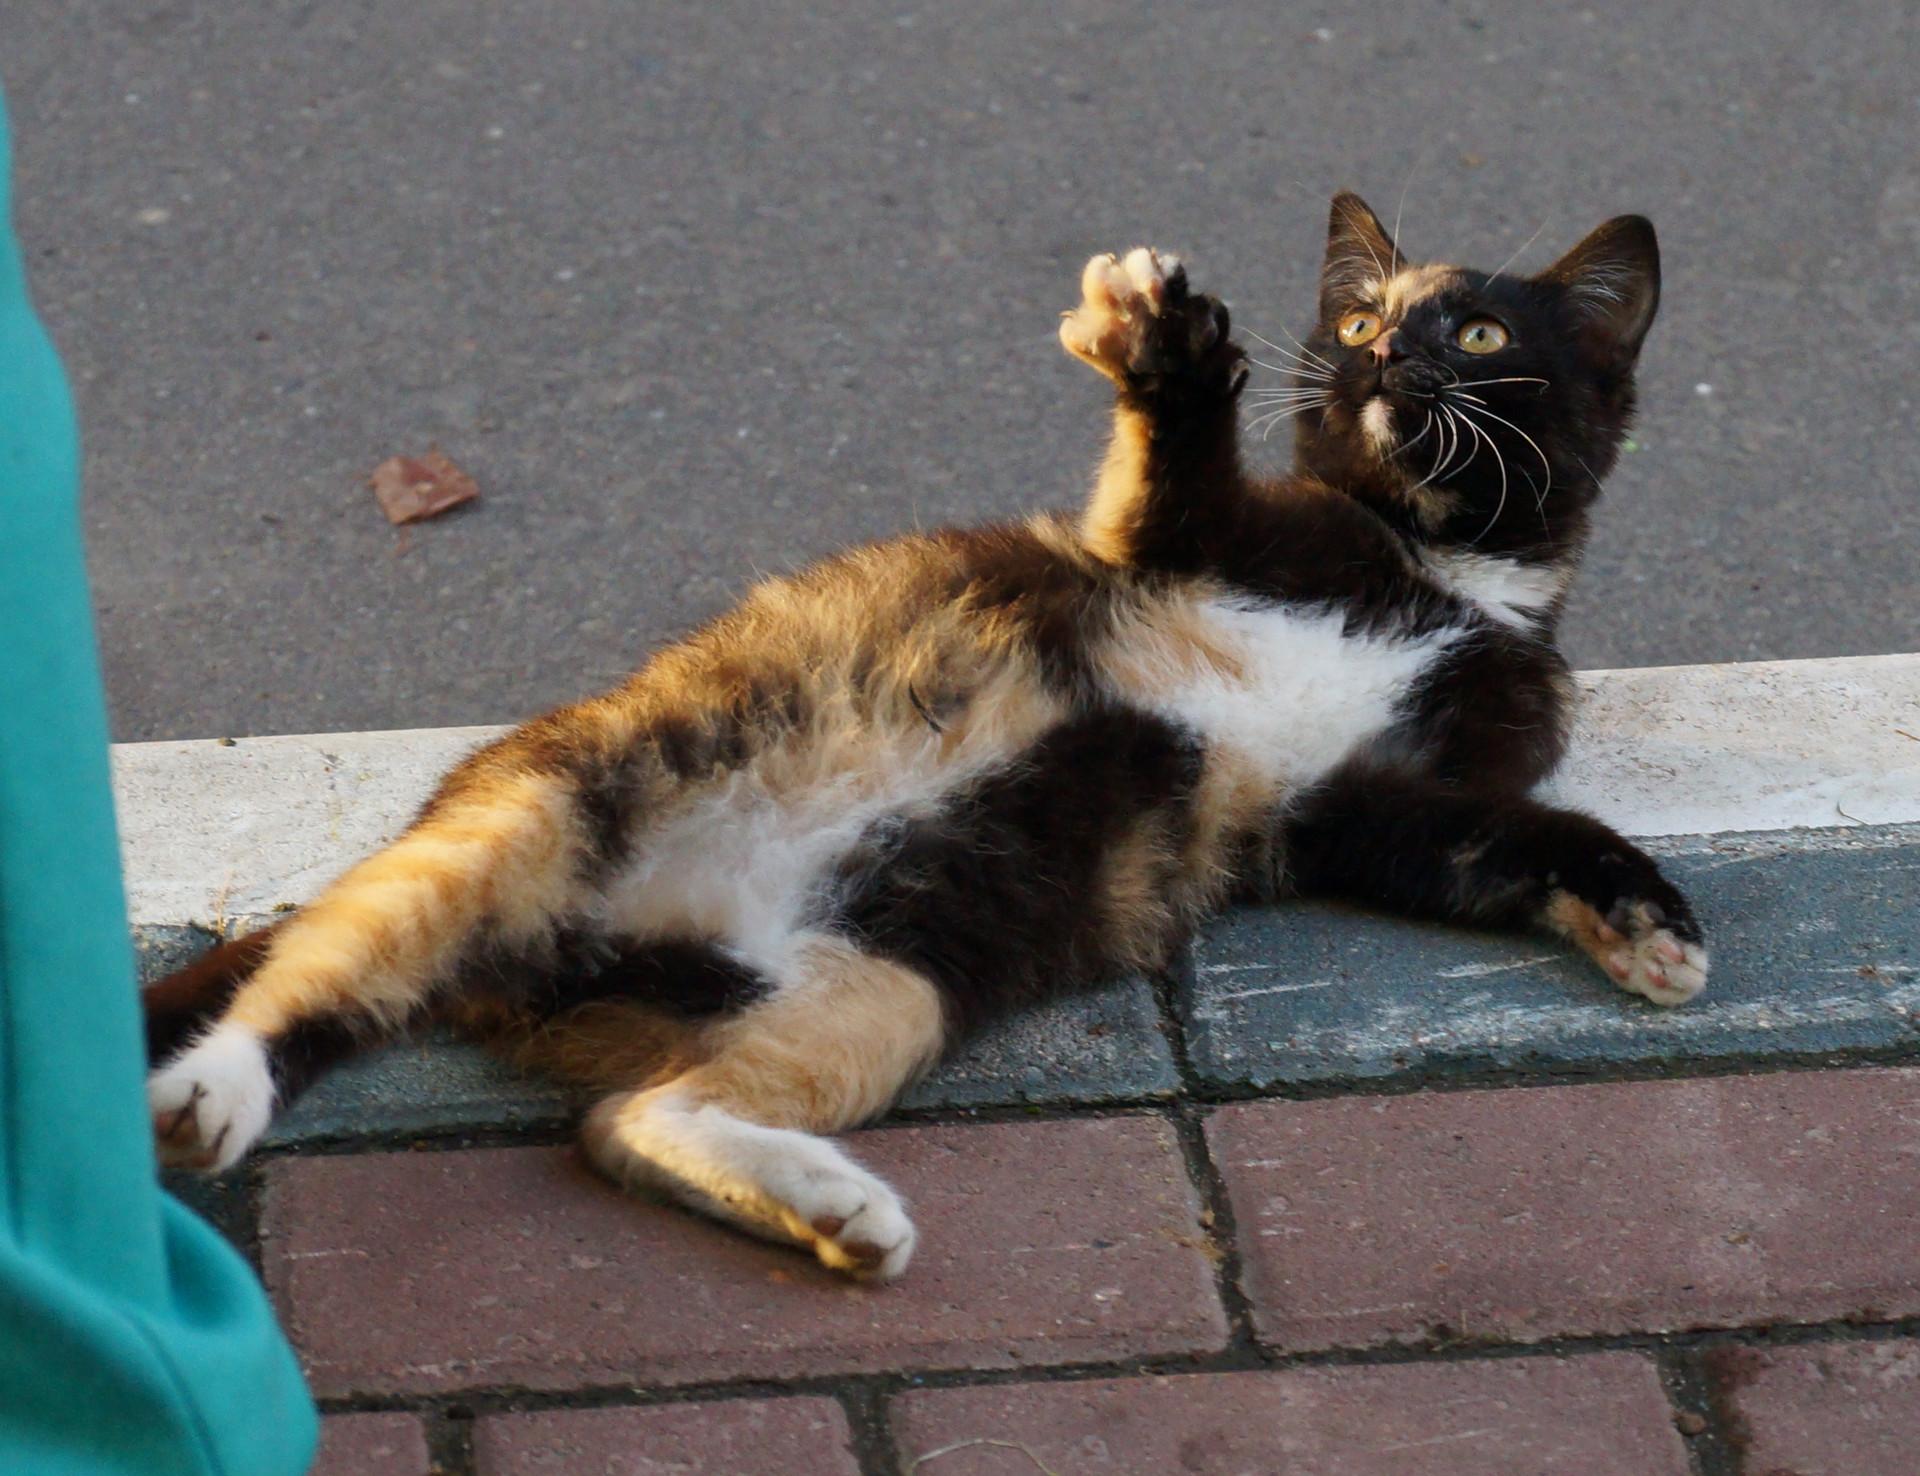 Chernushka, the cat from the box